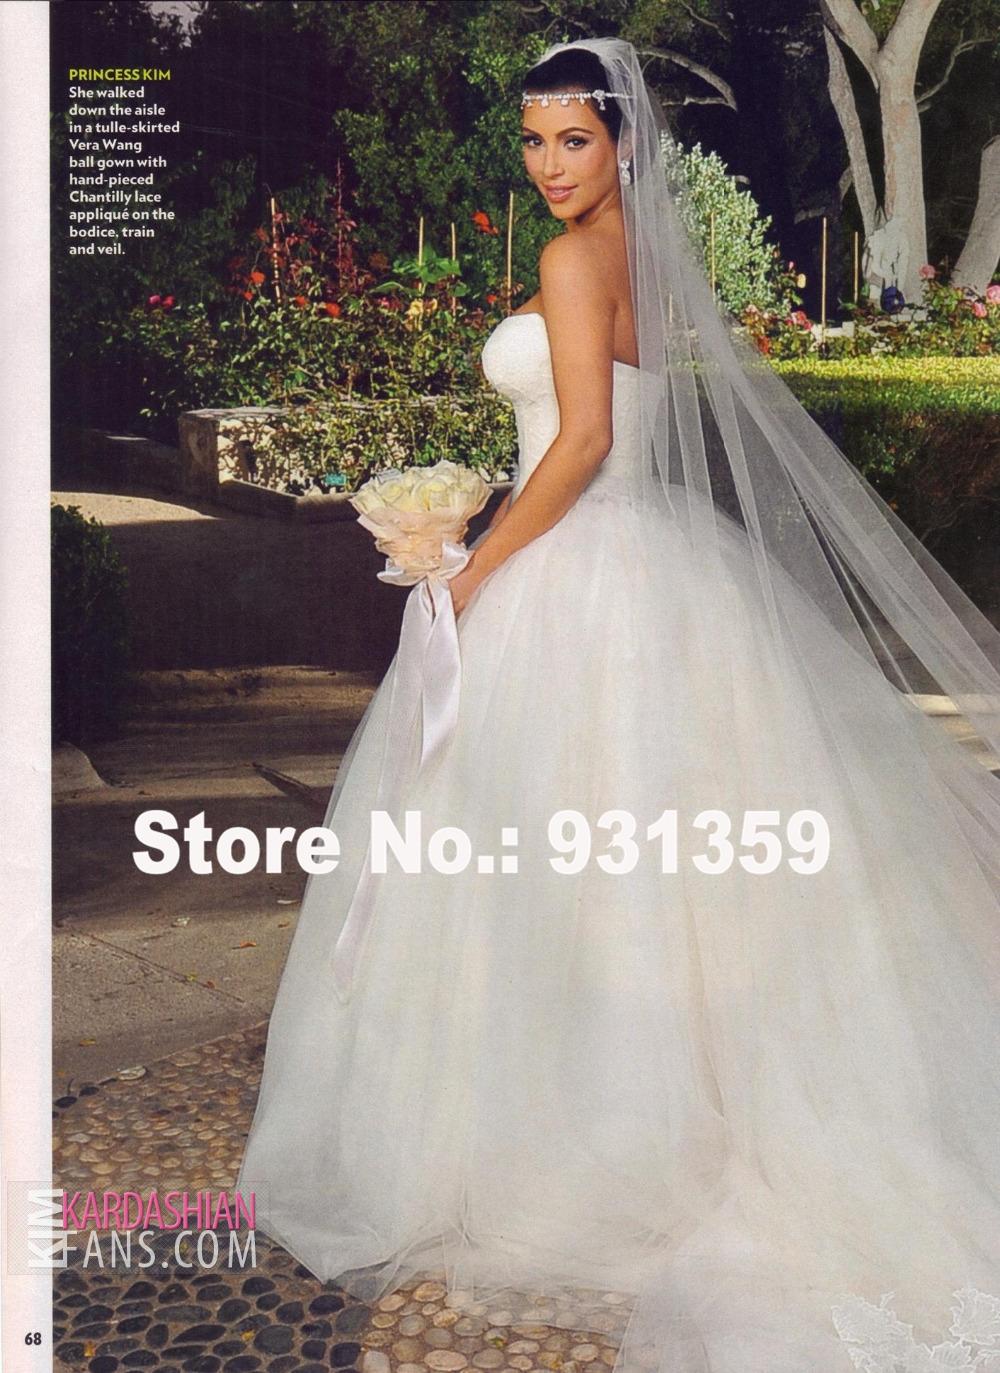 wedding dresses over 50 wedding dresses for petite wedding guest dresses for women over 50